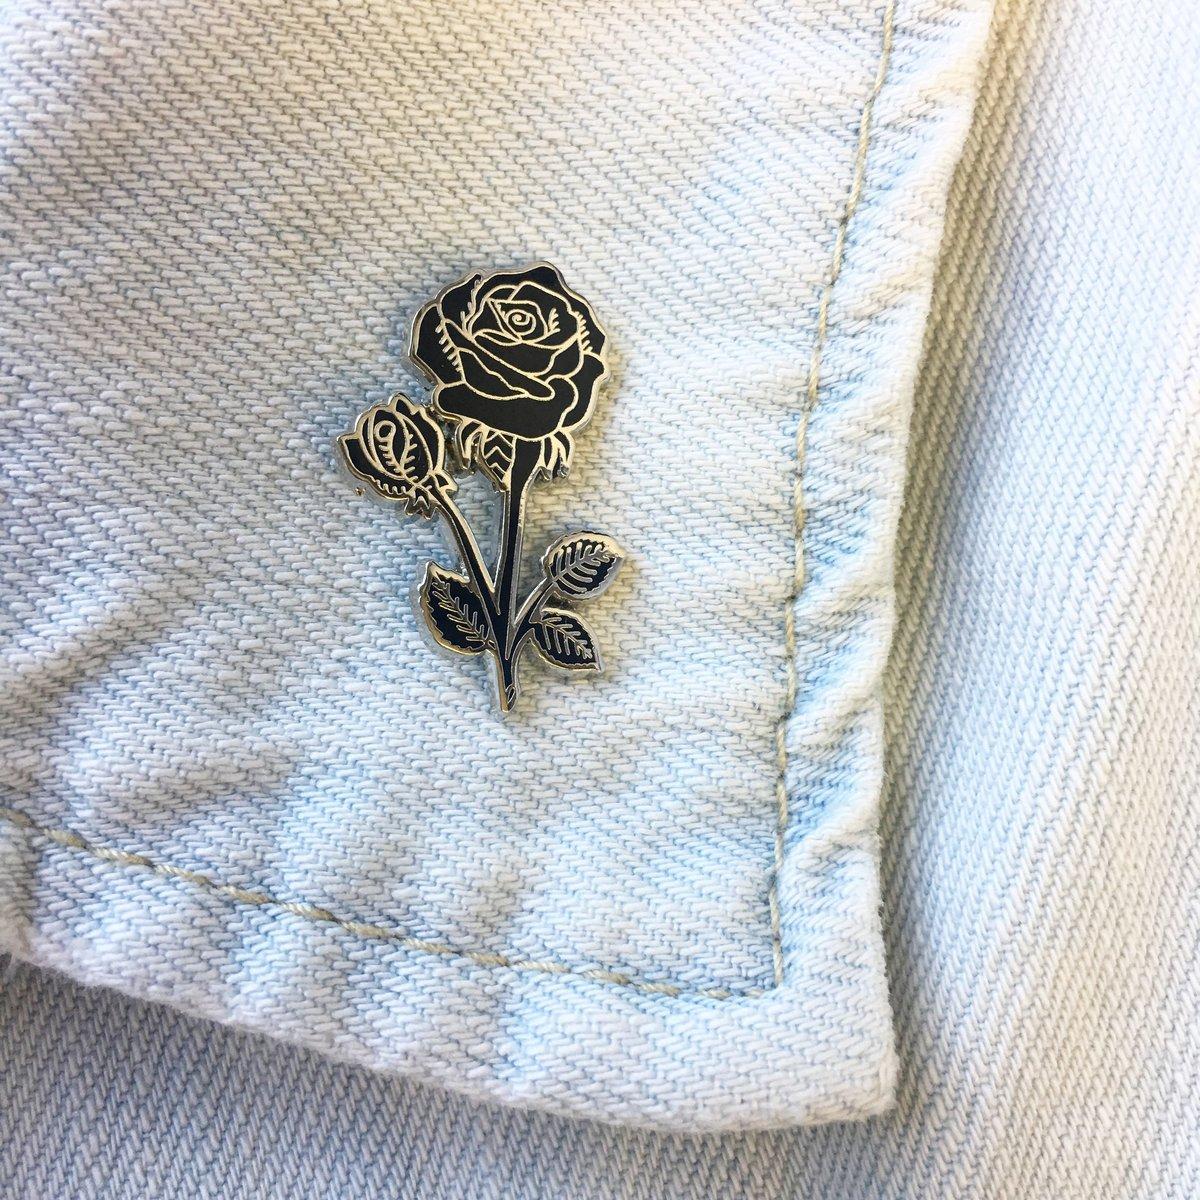 Rose Enamel Pin - Black & Silver